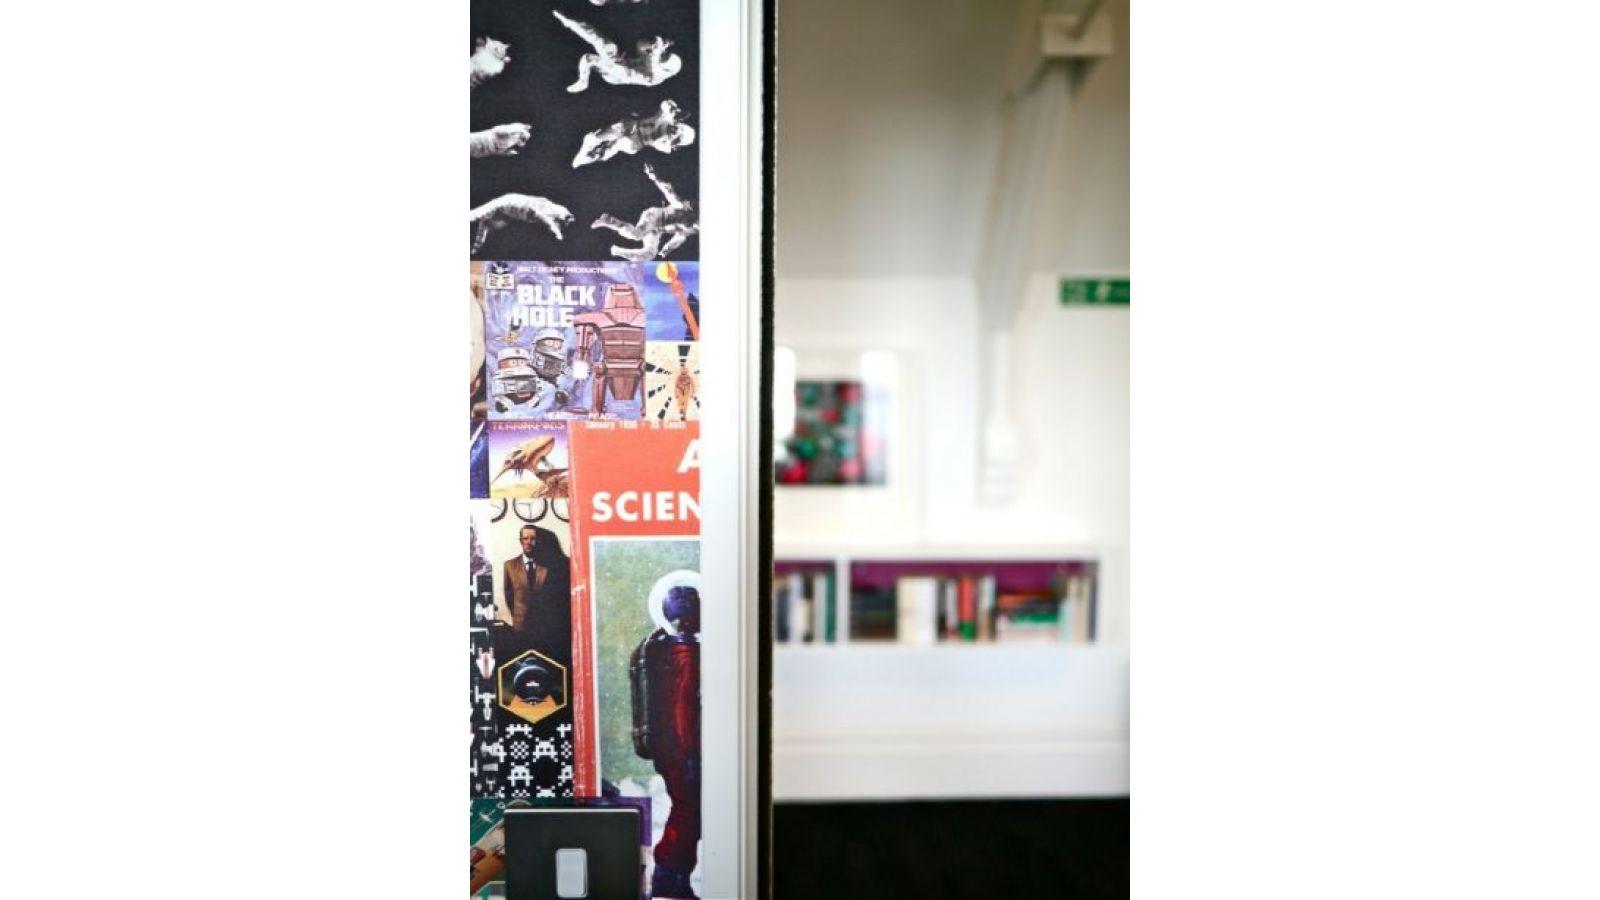 Custom Wallpaper Designs for Audible UK